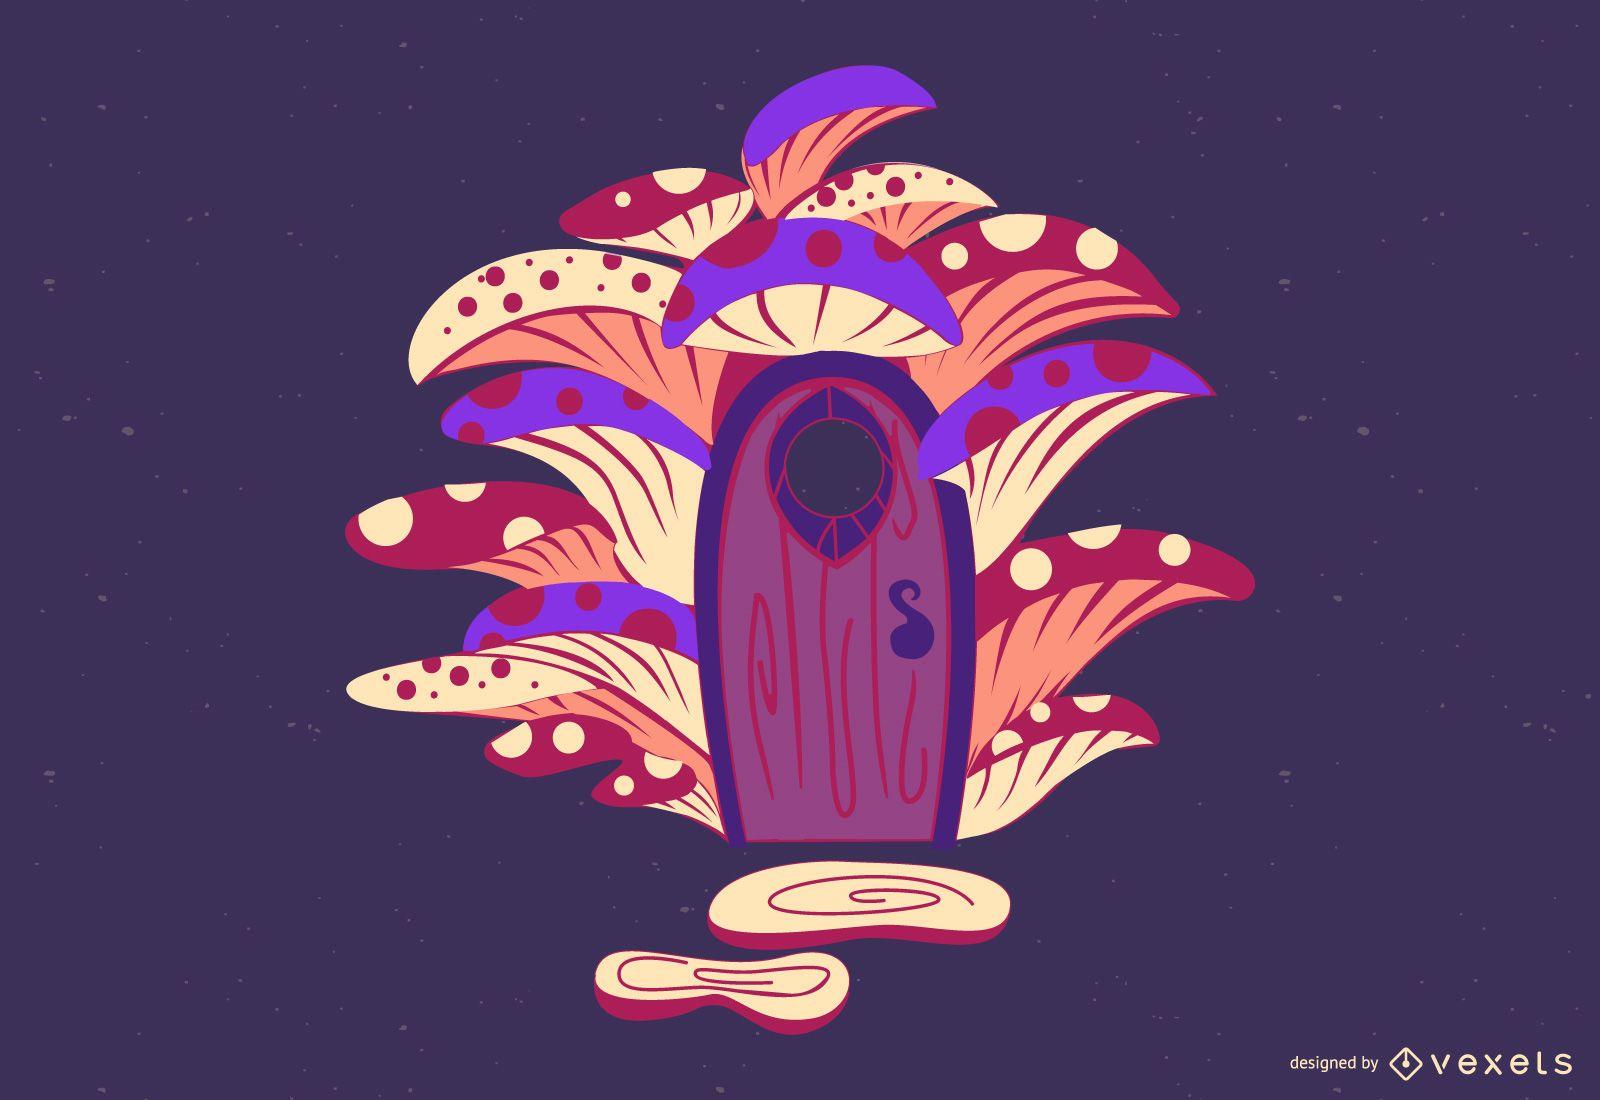 Fairy house illustration